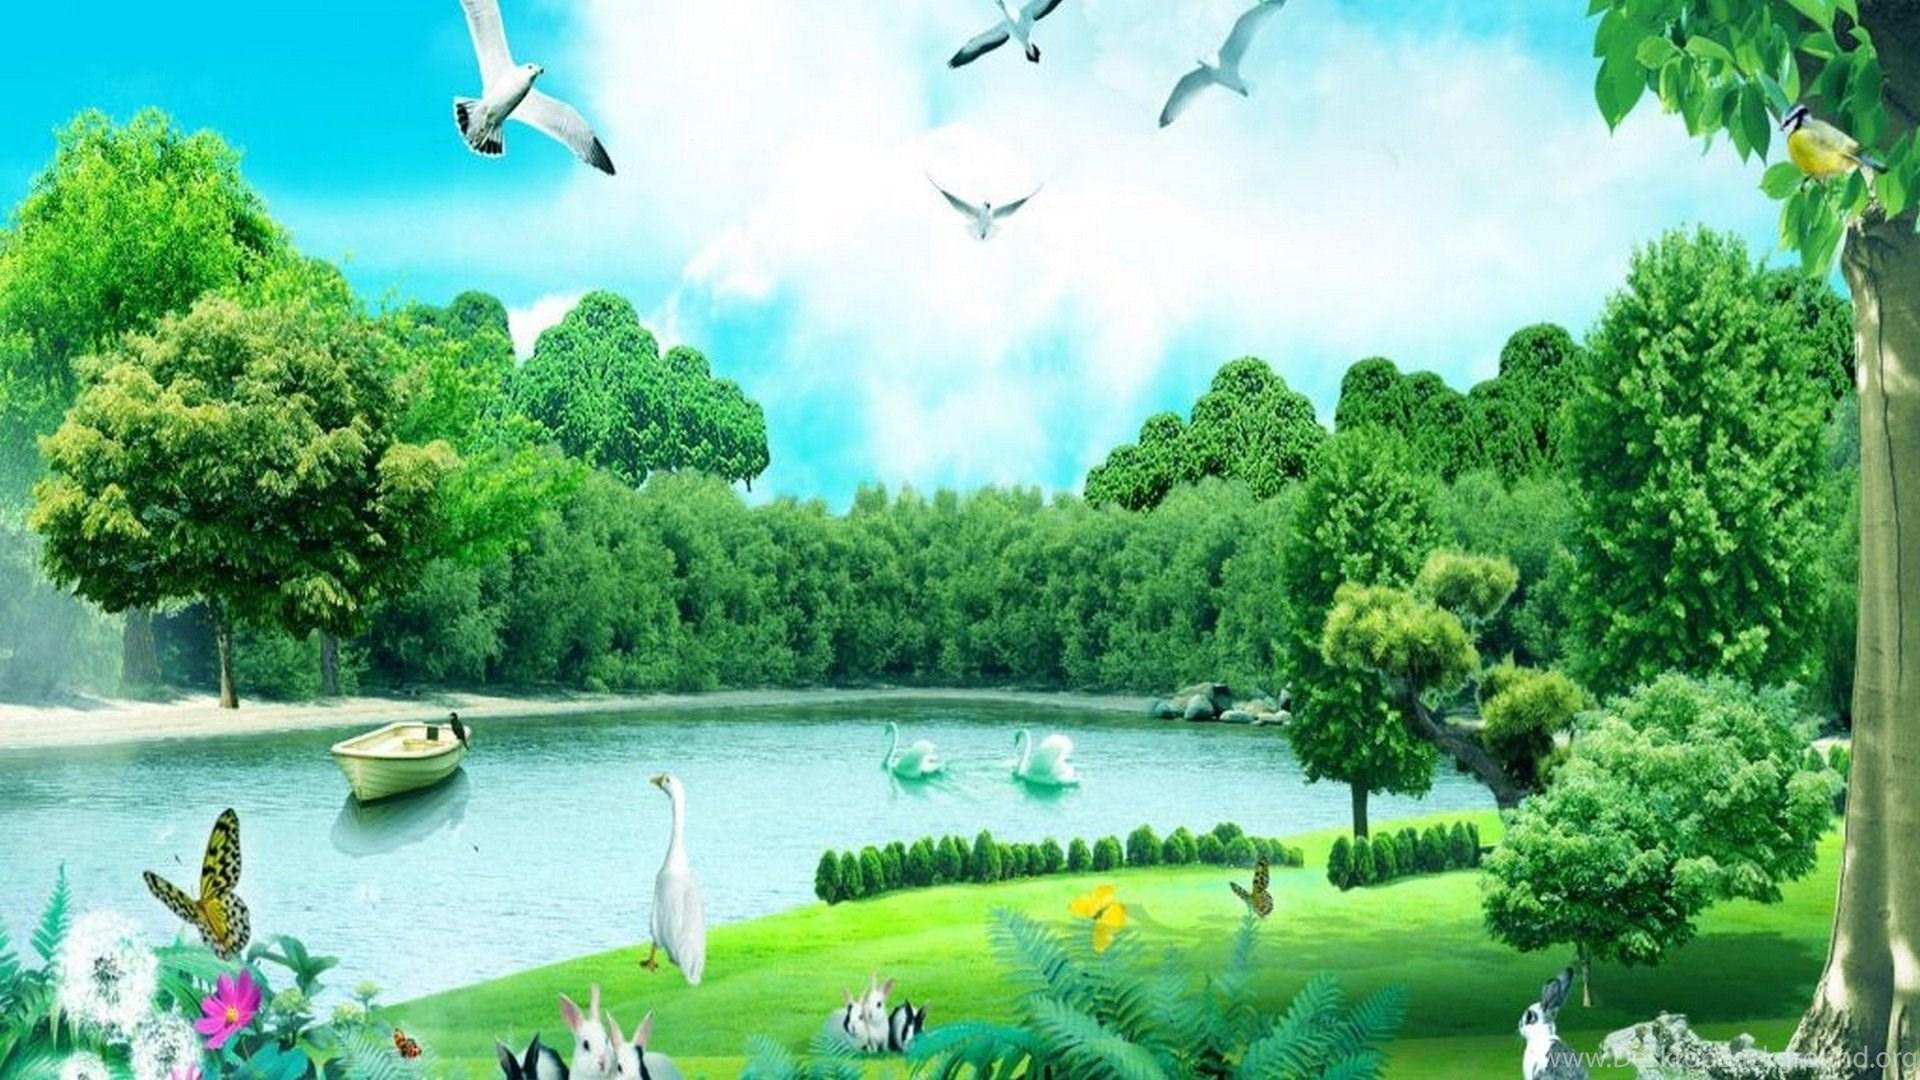 HD Forest Animals Summer Nature Wallpapers.jpg Desktop Background